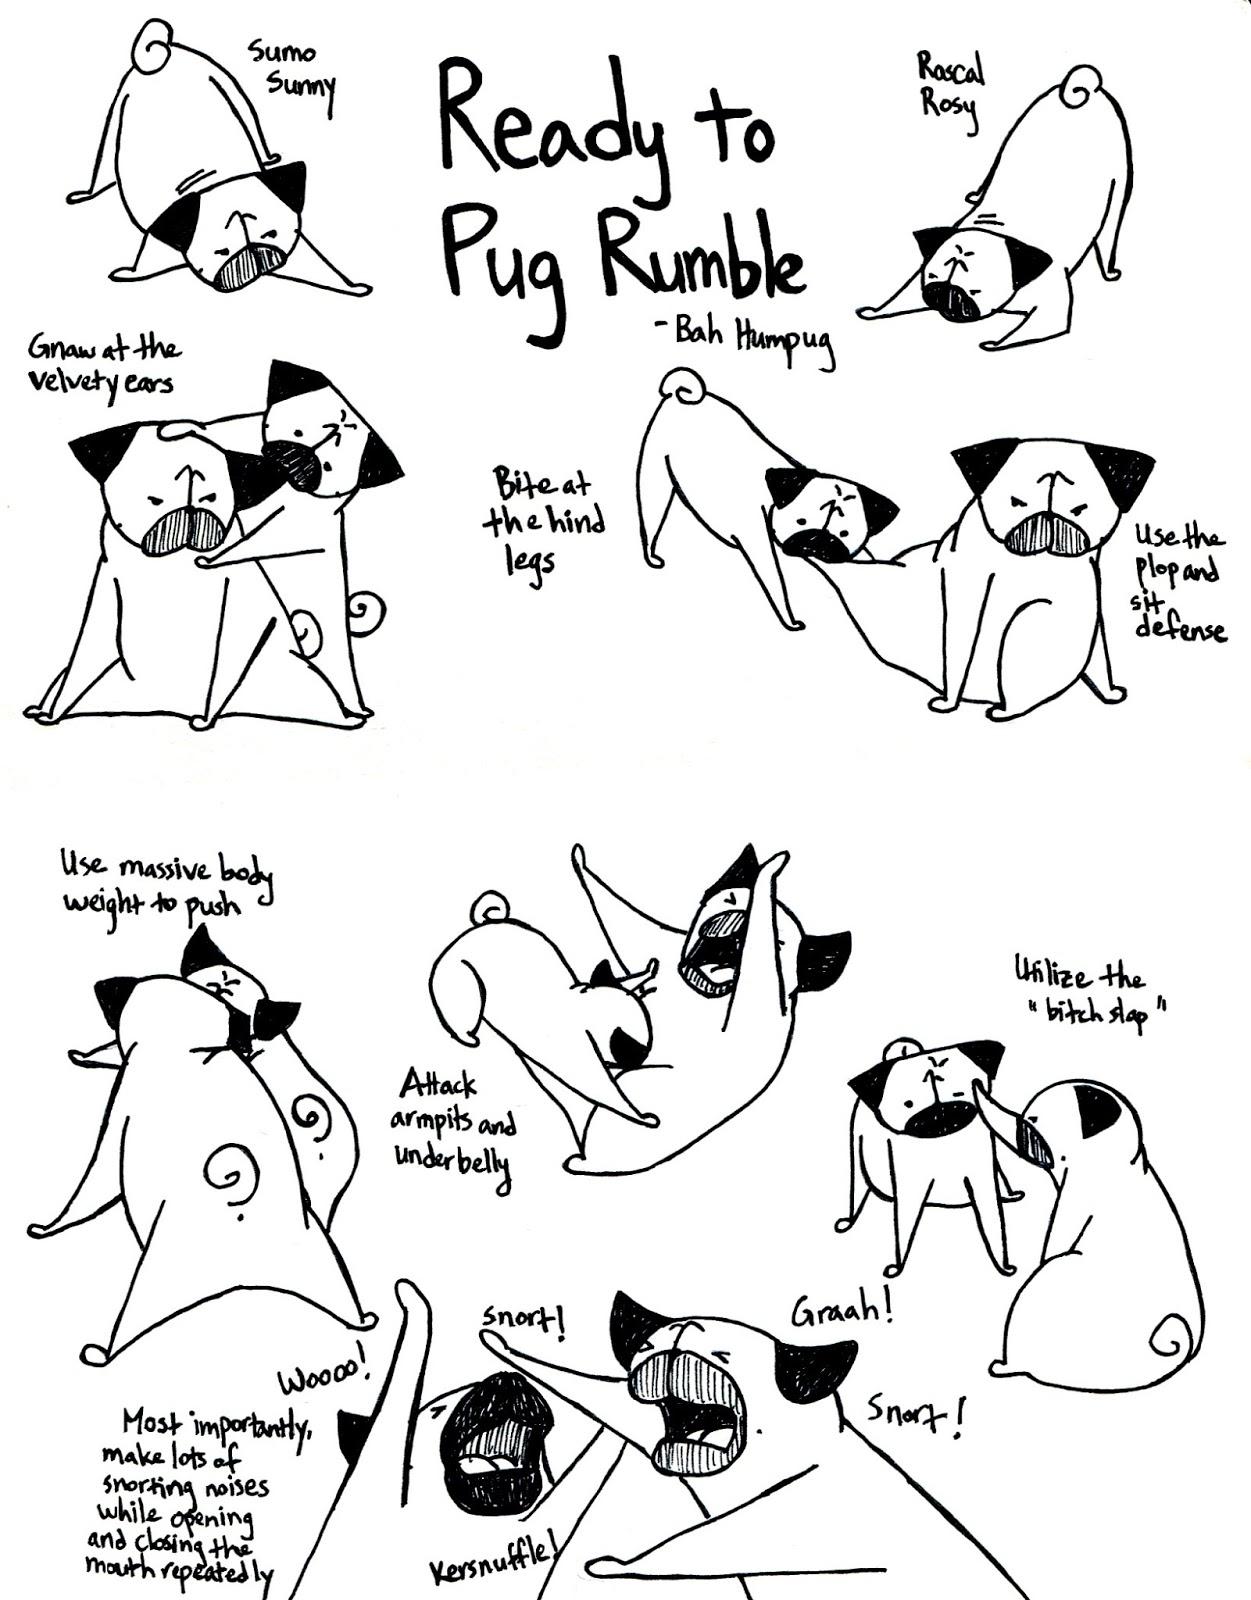 Drawn pug poo Ruuumbbble! Ready Pug Humpug: Let's